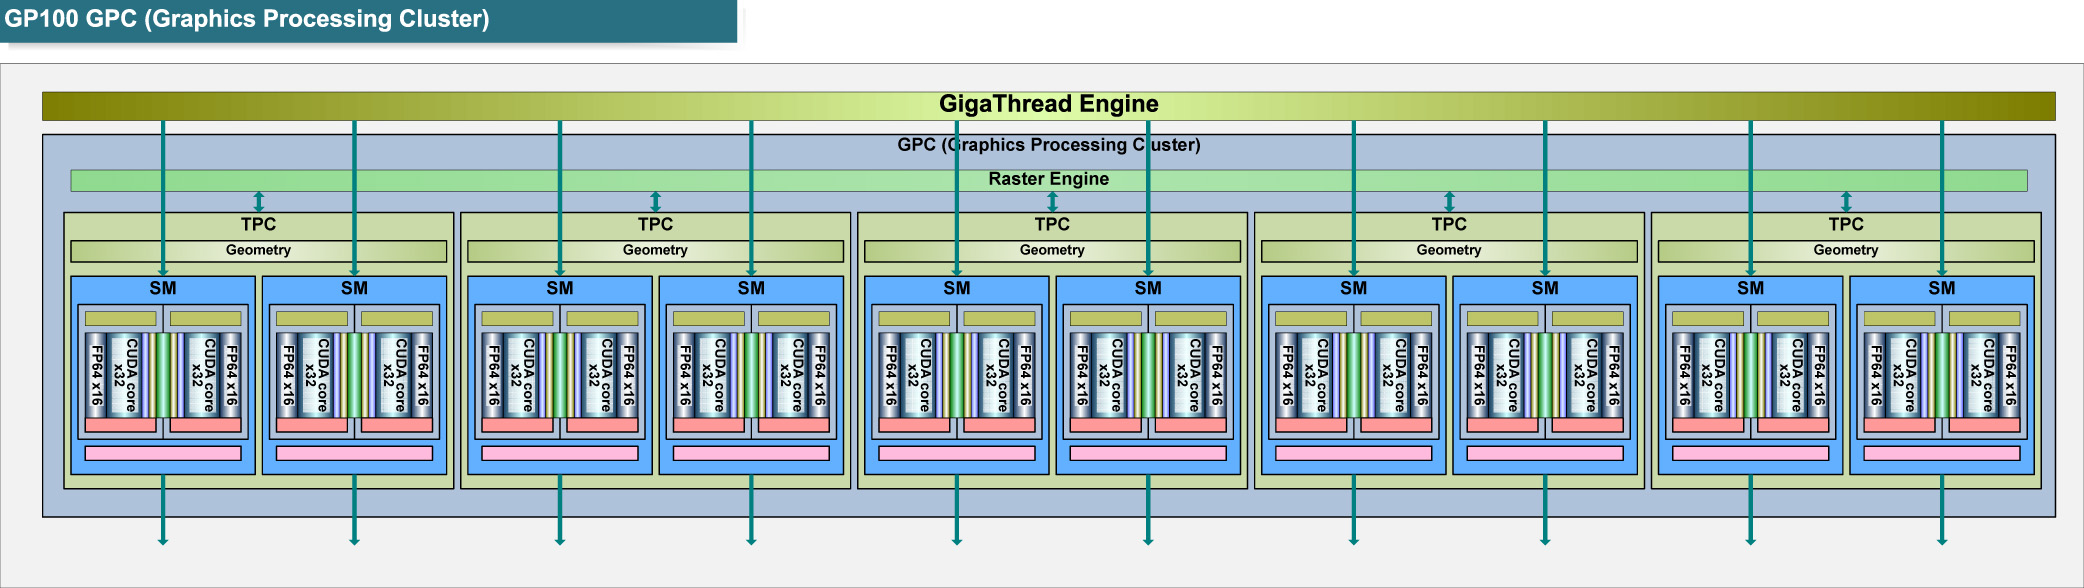 "Tesla P100のGPCブロック図<br class="""">PDF版は<span class=""img-inline raw""><a href=""/video/pcw/docs/757/916/p17.pdf"" ipw_status=""1"" ipw_linktype=""filelink_raw"" class=""resource"">こちら</a></span>"